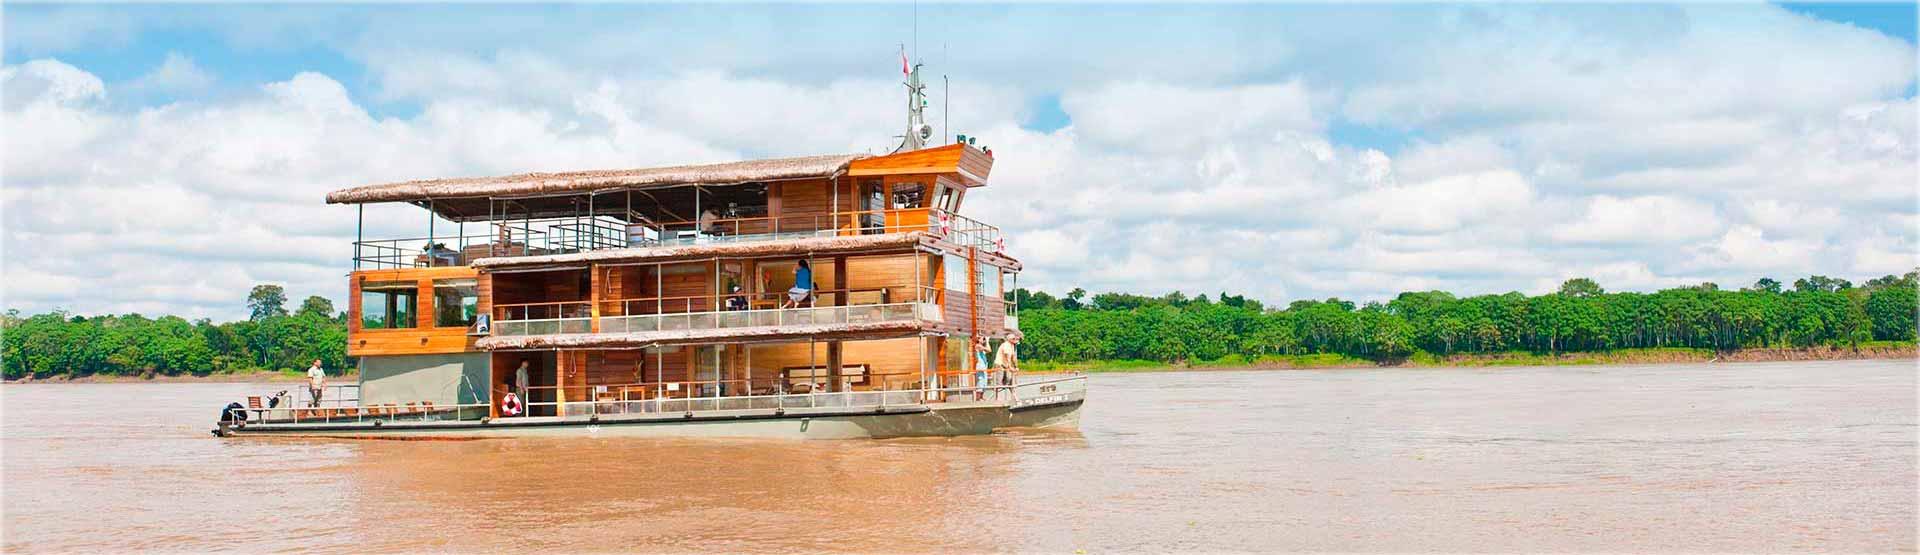 Delfin I Amazon Cruise  Kuoda Travel  Personalized Travel To Peru